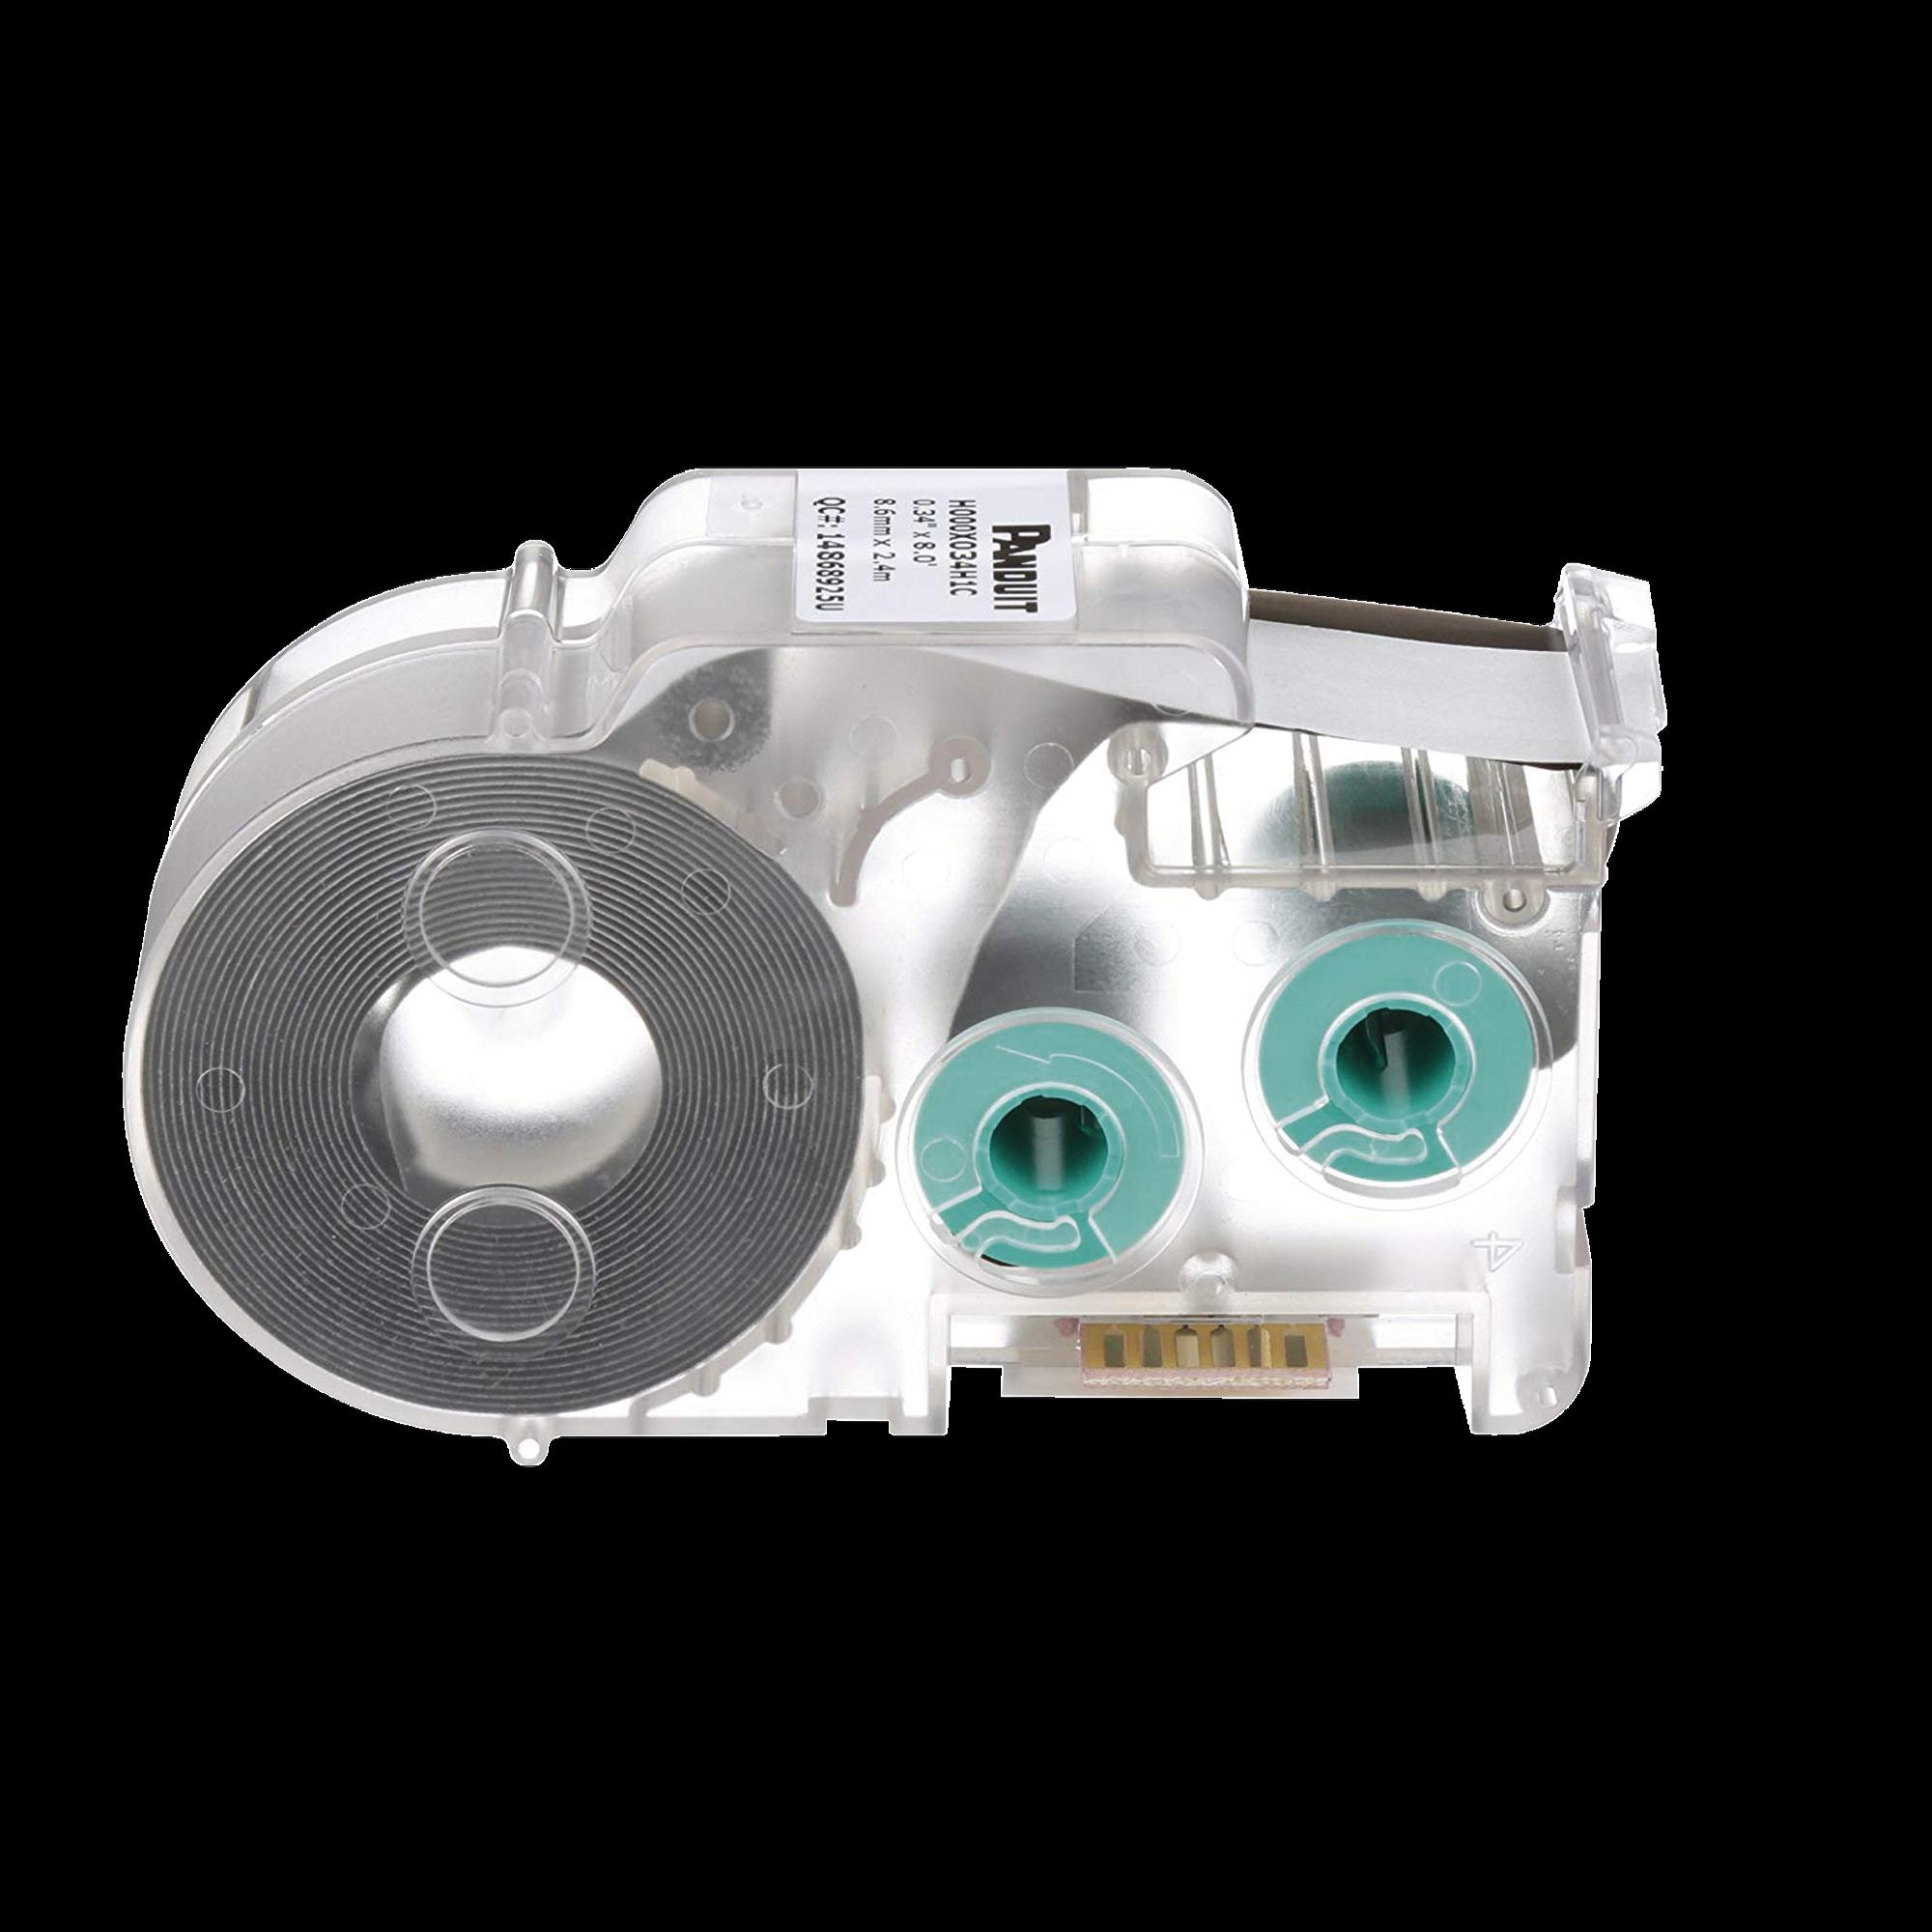 Casete de Etiquetas de Cinta Continua, Tubo TermoContractil, 4.6 mm de Diámetro, 8.6 mm de Ancho, 2.4 m de largo, para Cables 18-12 AWG, Color Blanco